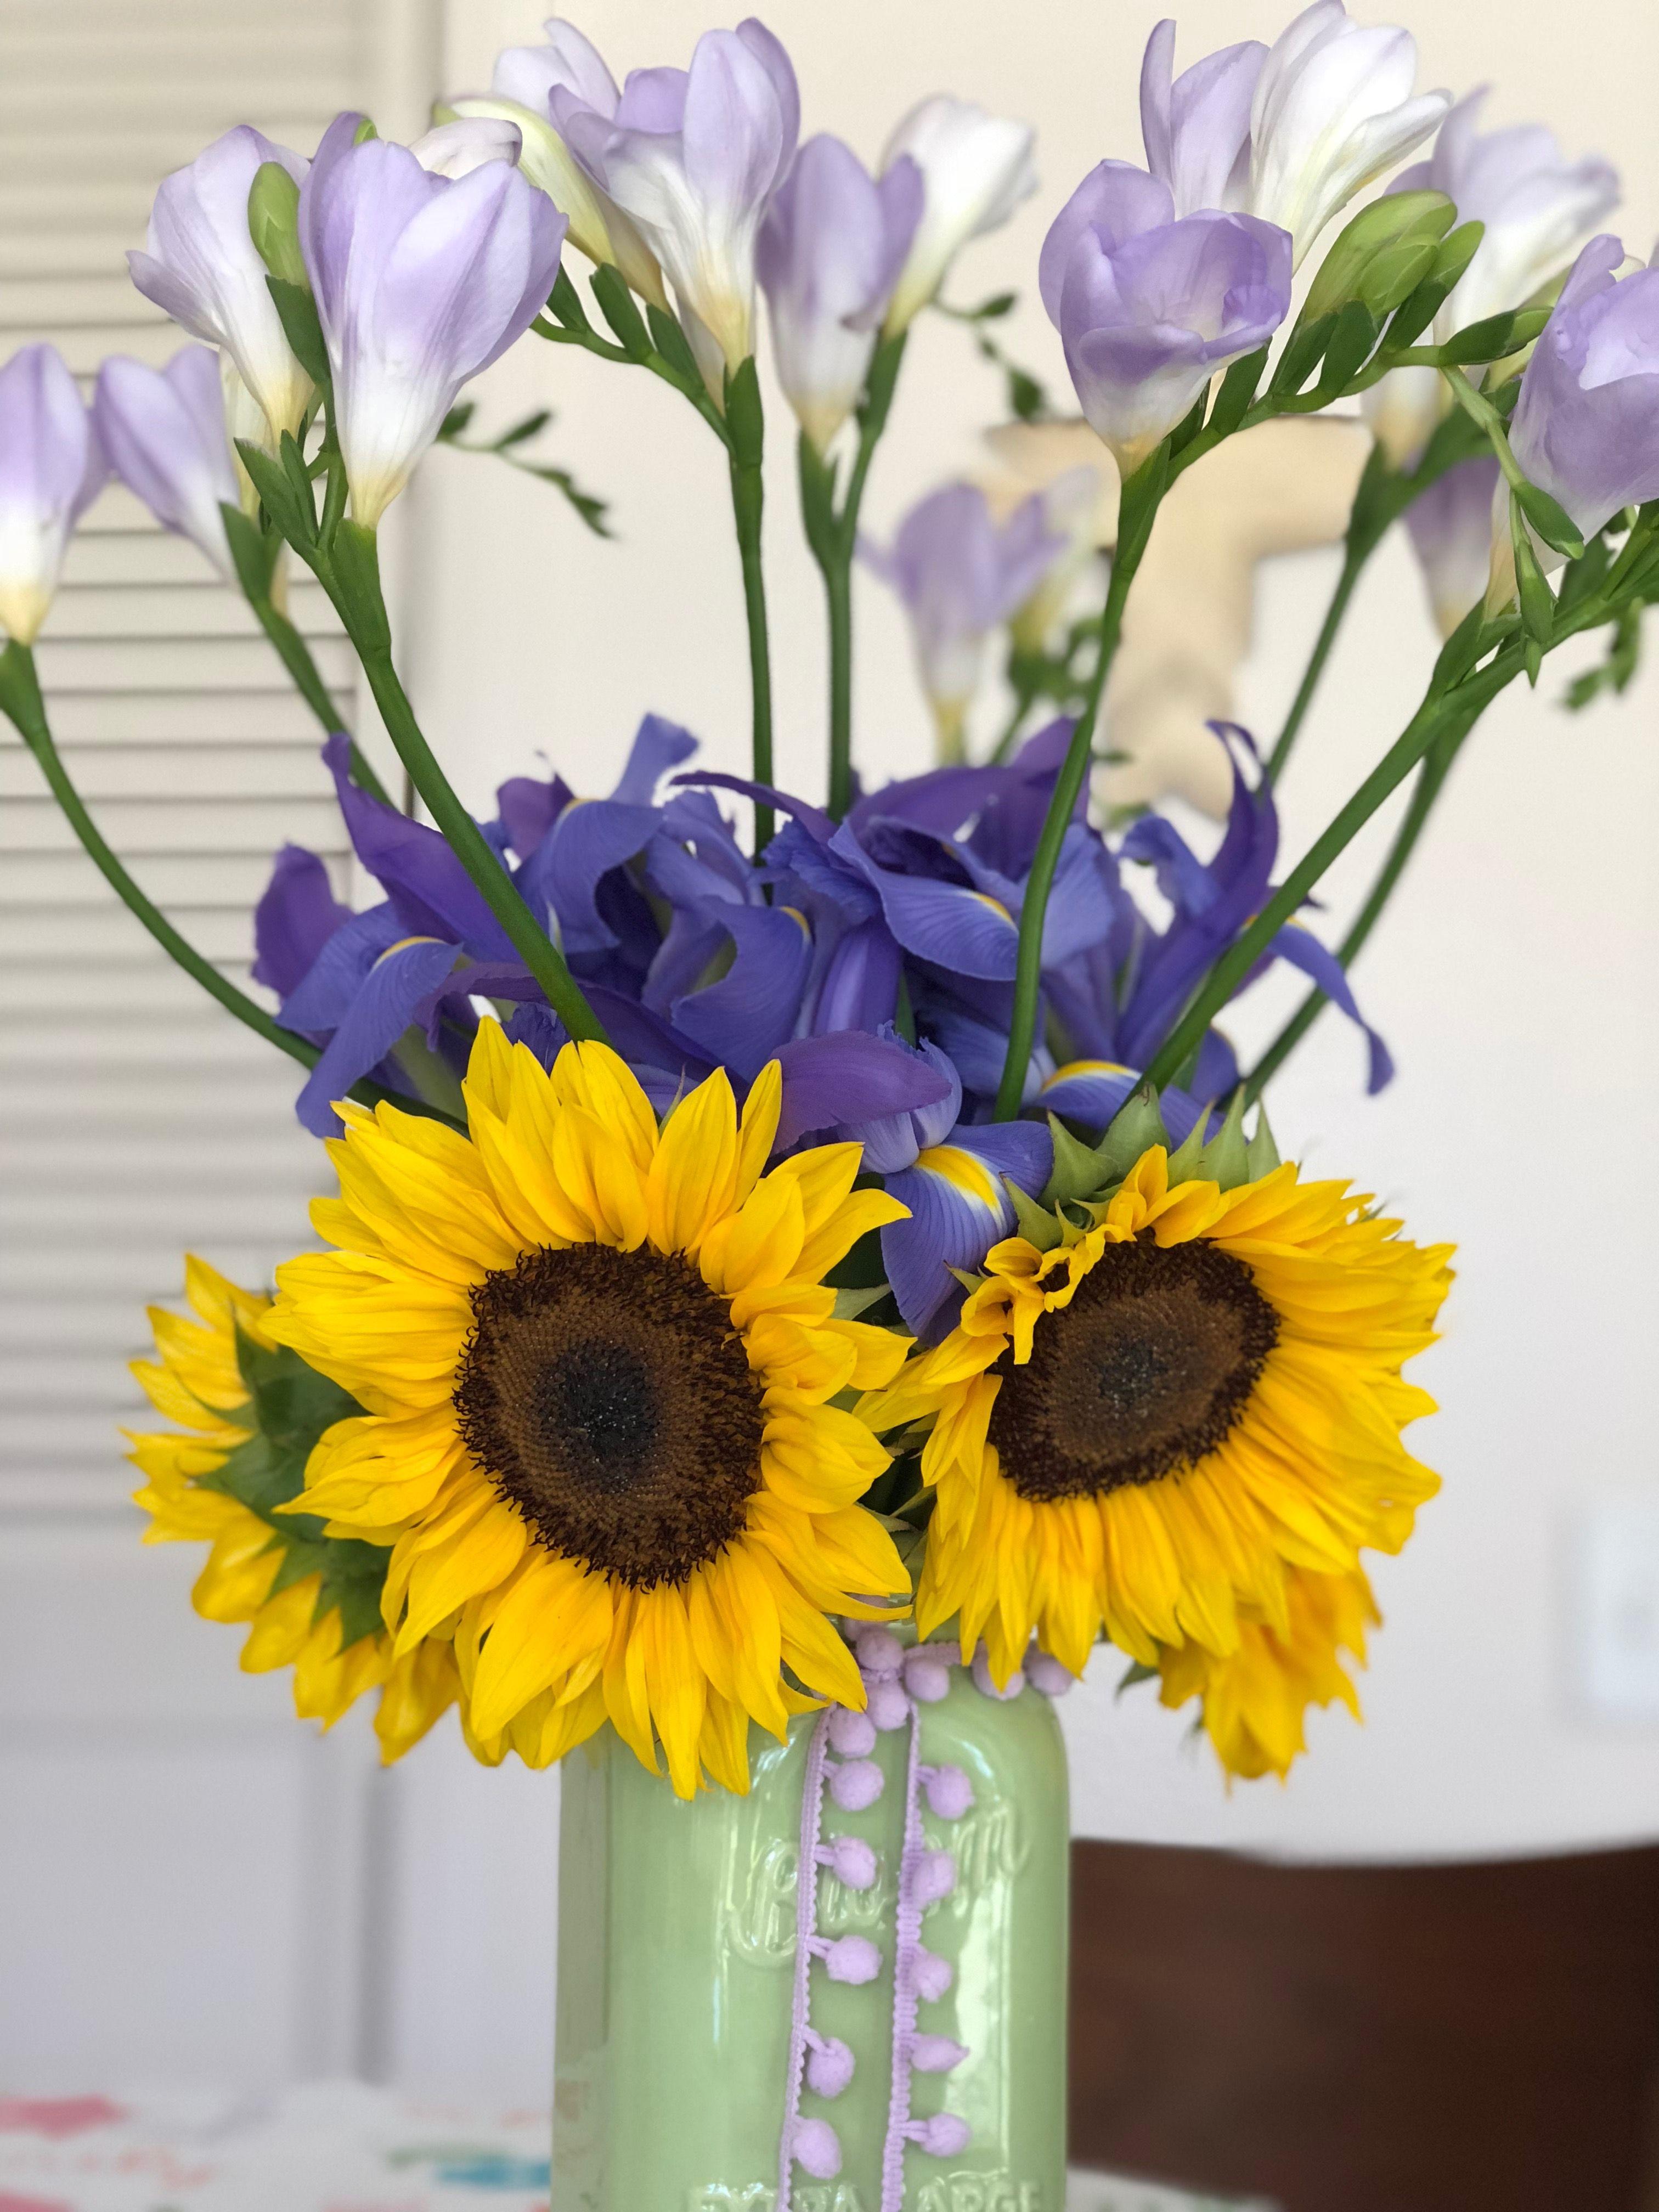 Beautiful flower arrangement sunflowers iris freesia spring beautiful flower arrangement sunflowers iris freesia spring flowers izmirmasajfo